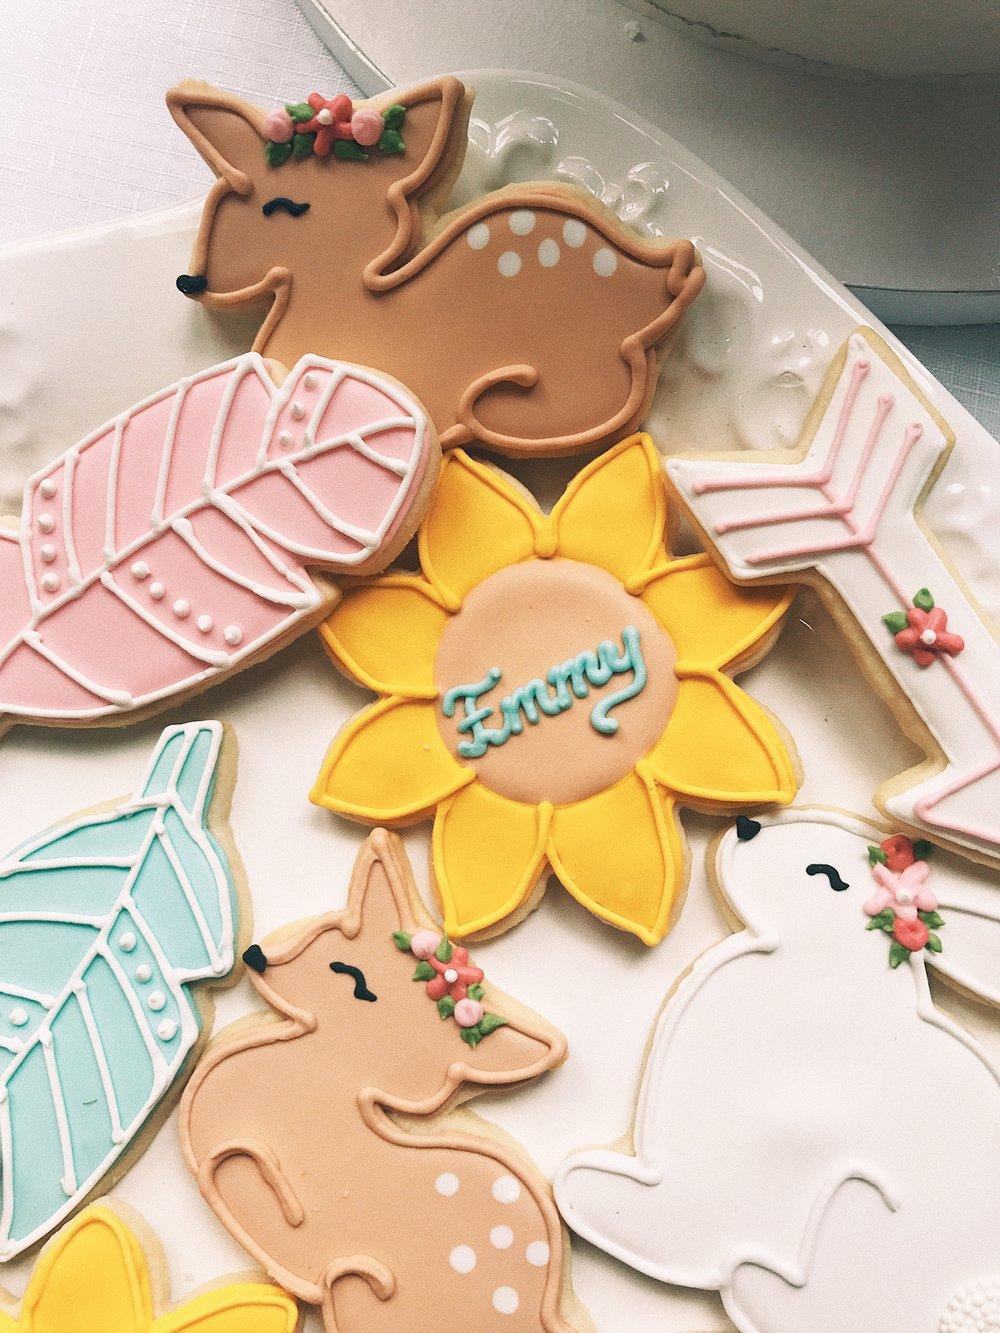 Boho Baby Shower: Celebrating Emmy via chelceytate.com